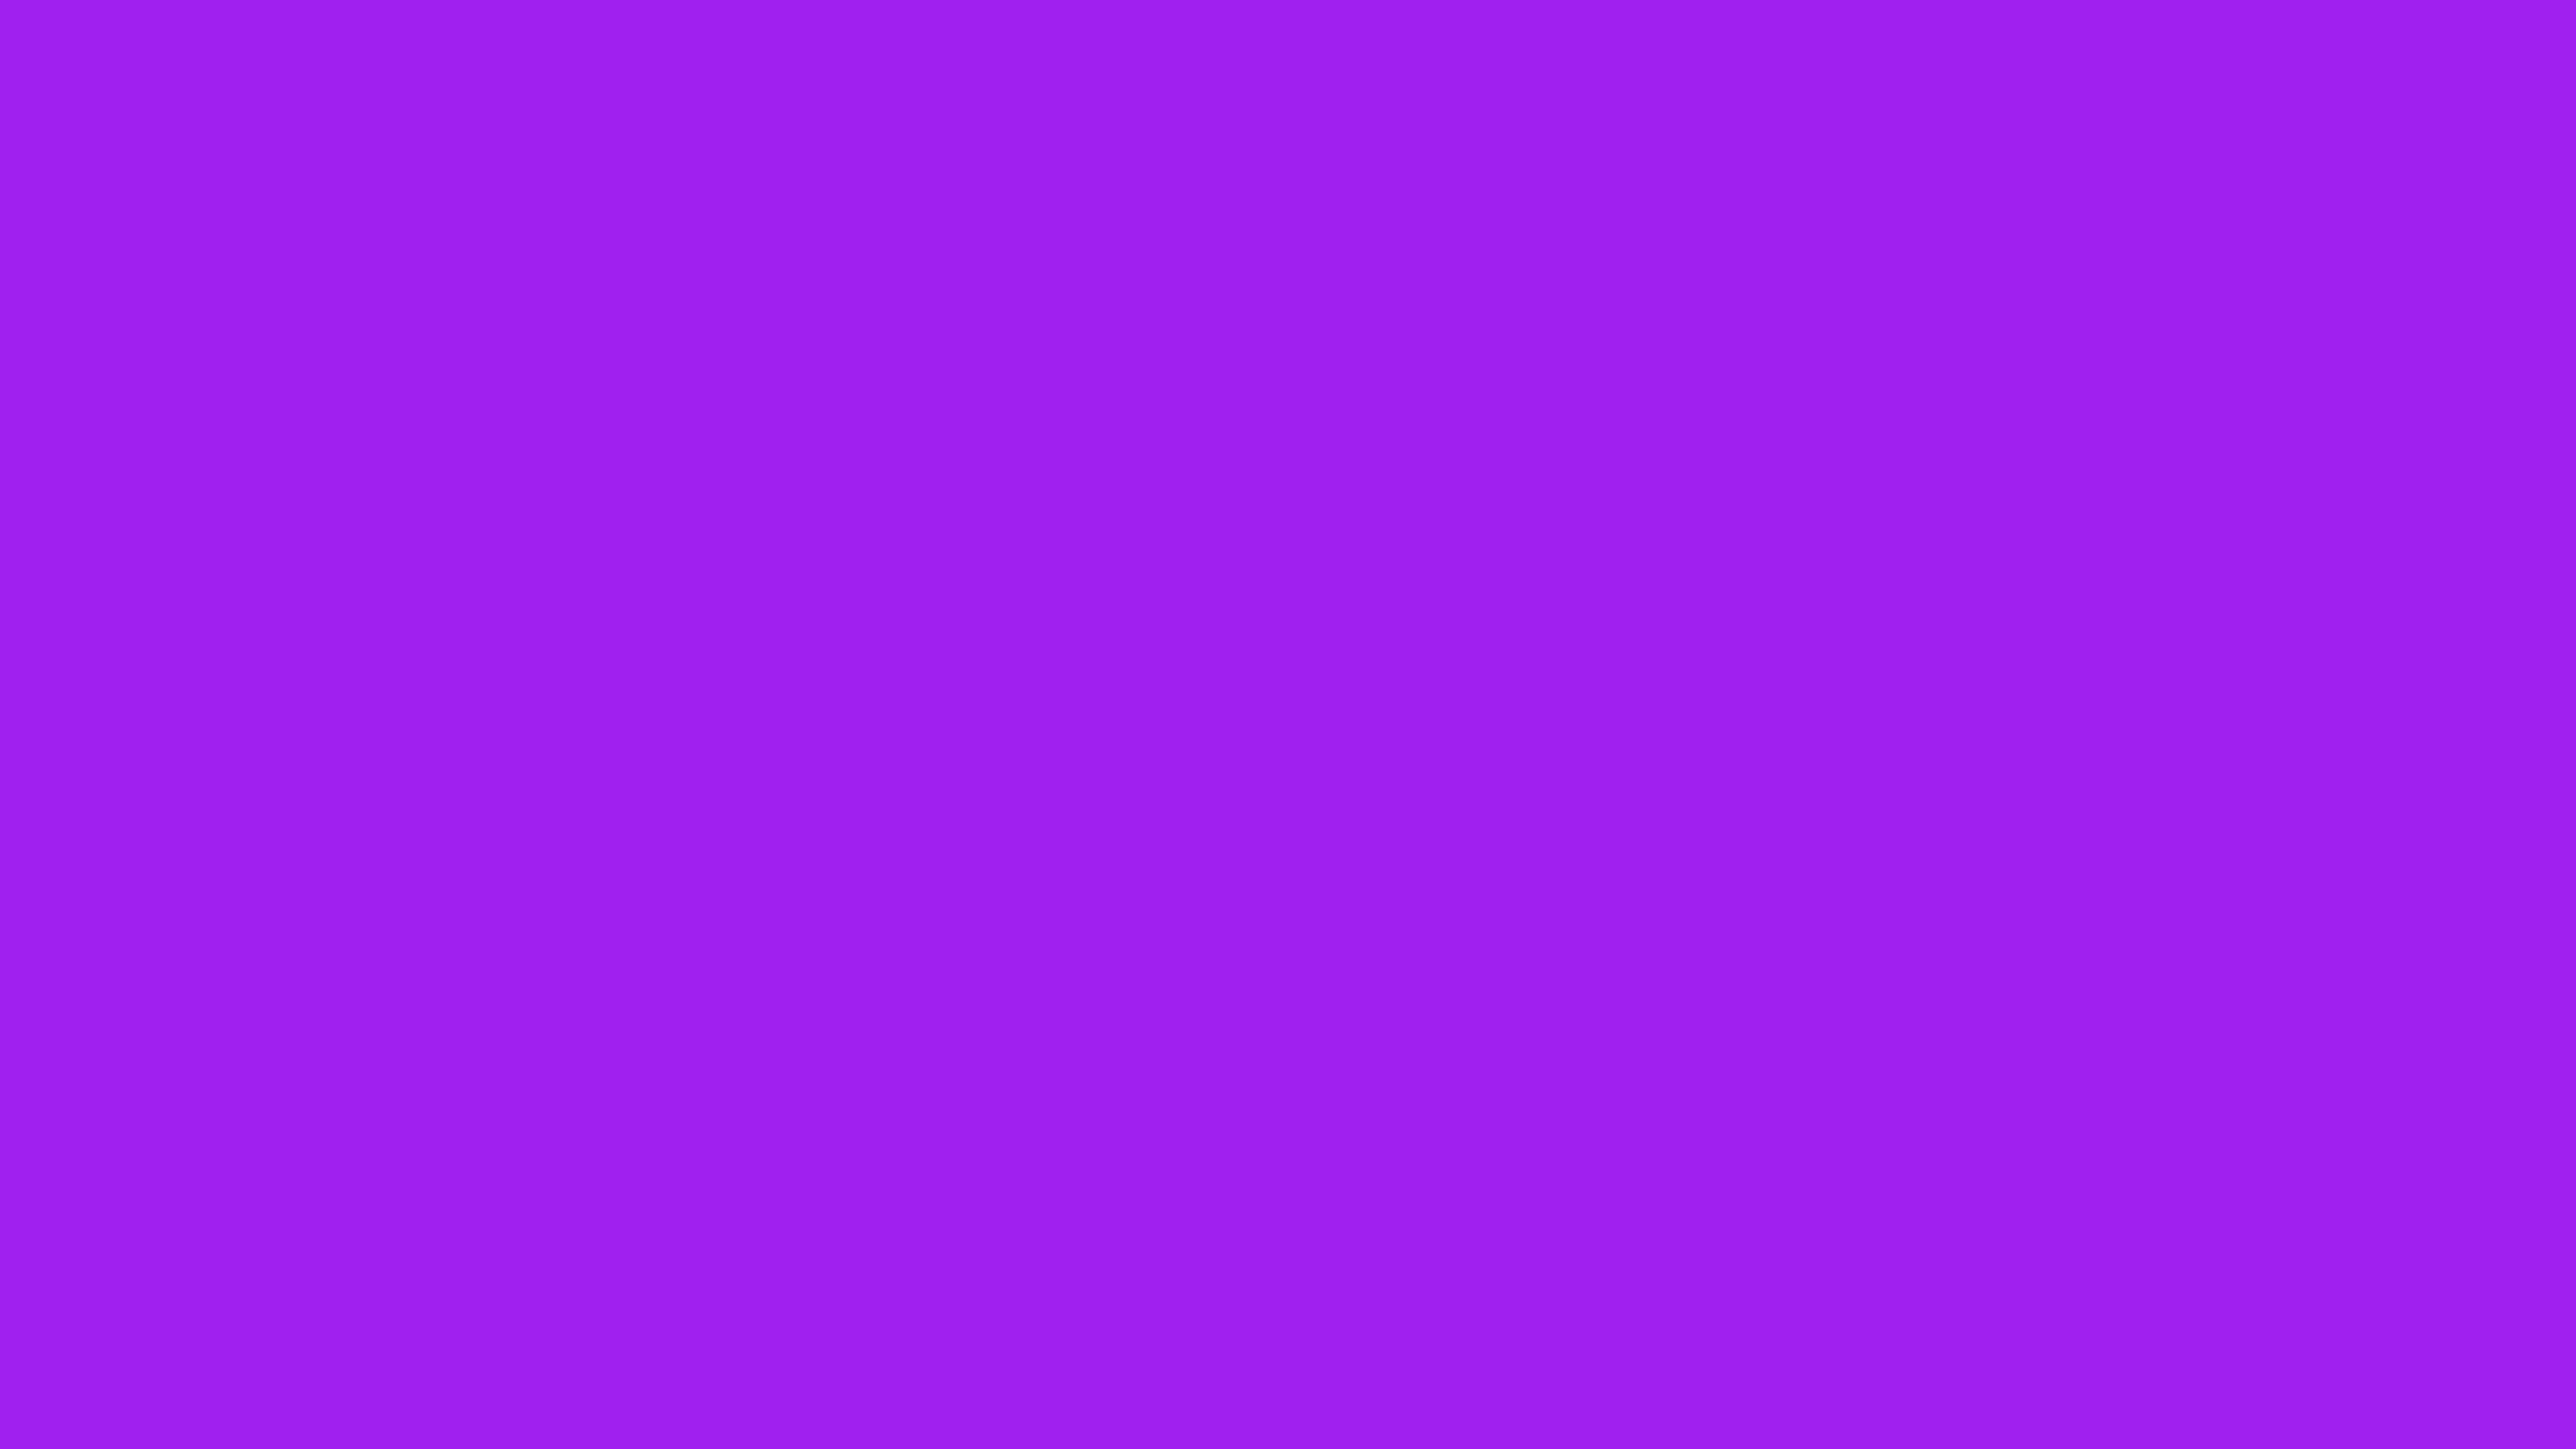 4096x2304 Purple X11 Gui Solid Color Background